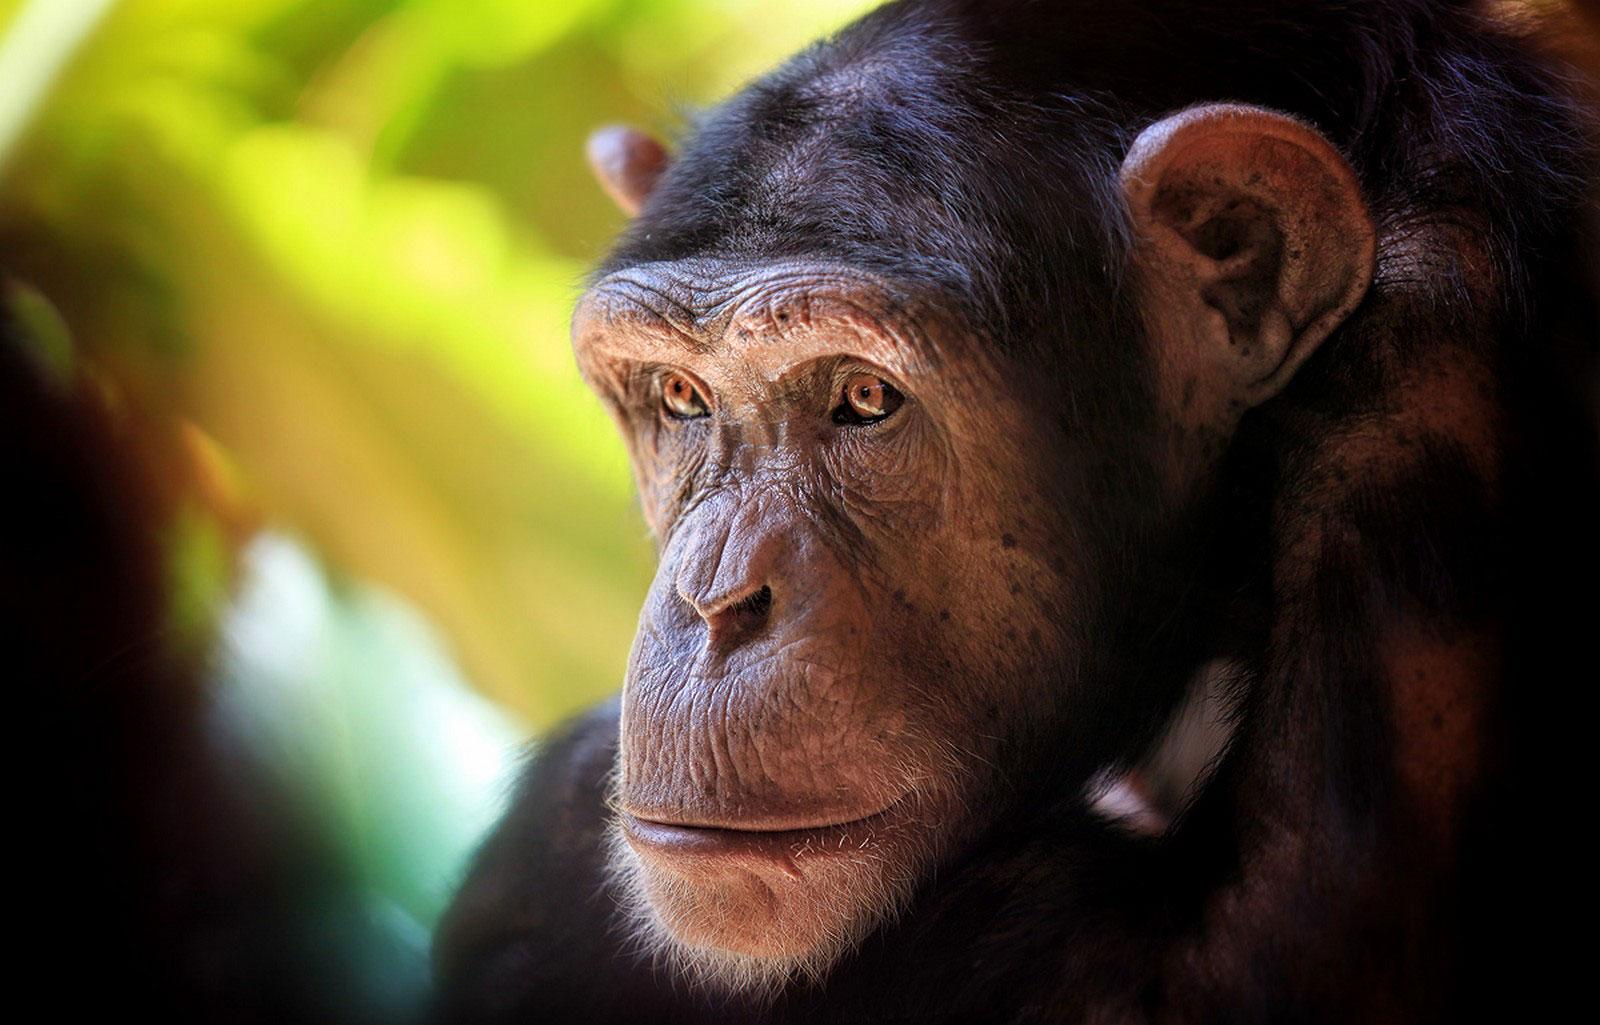 обезьяна, фотография